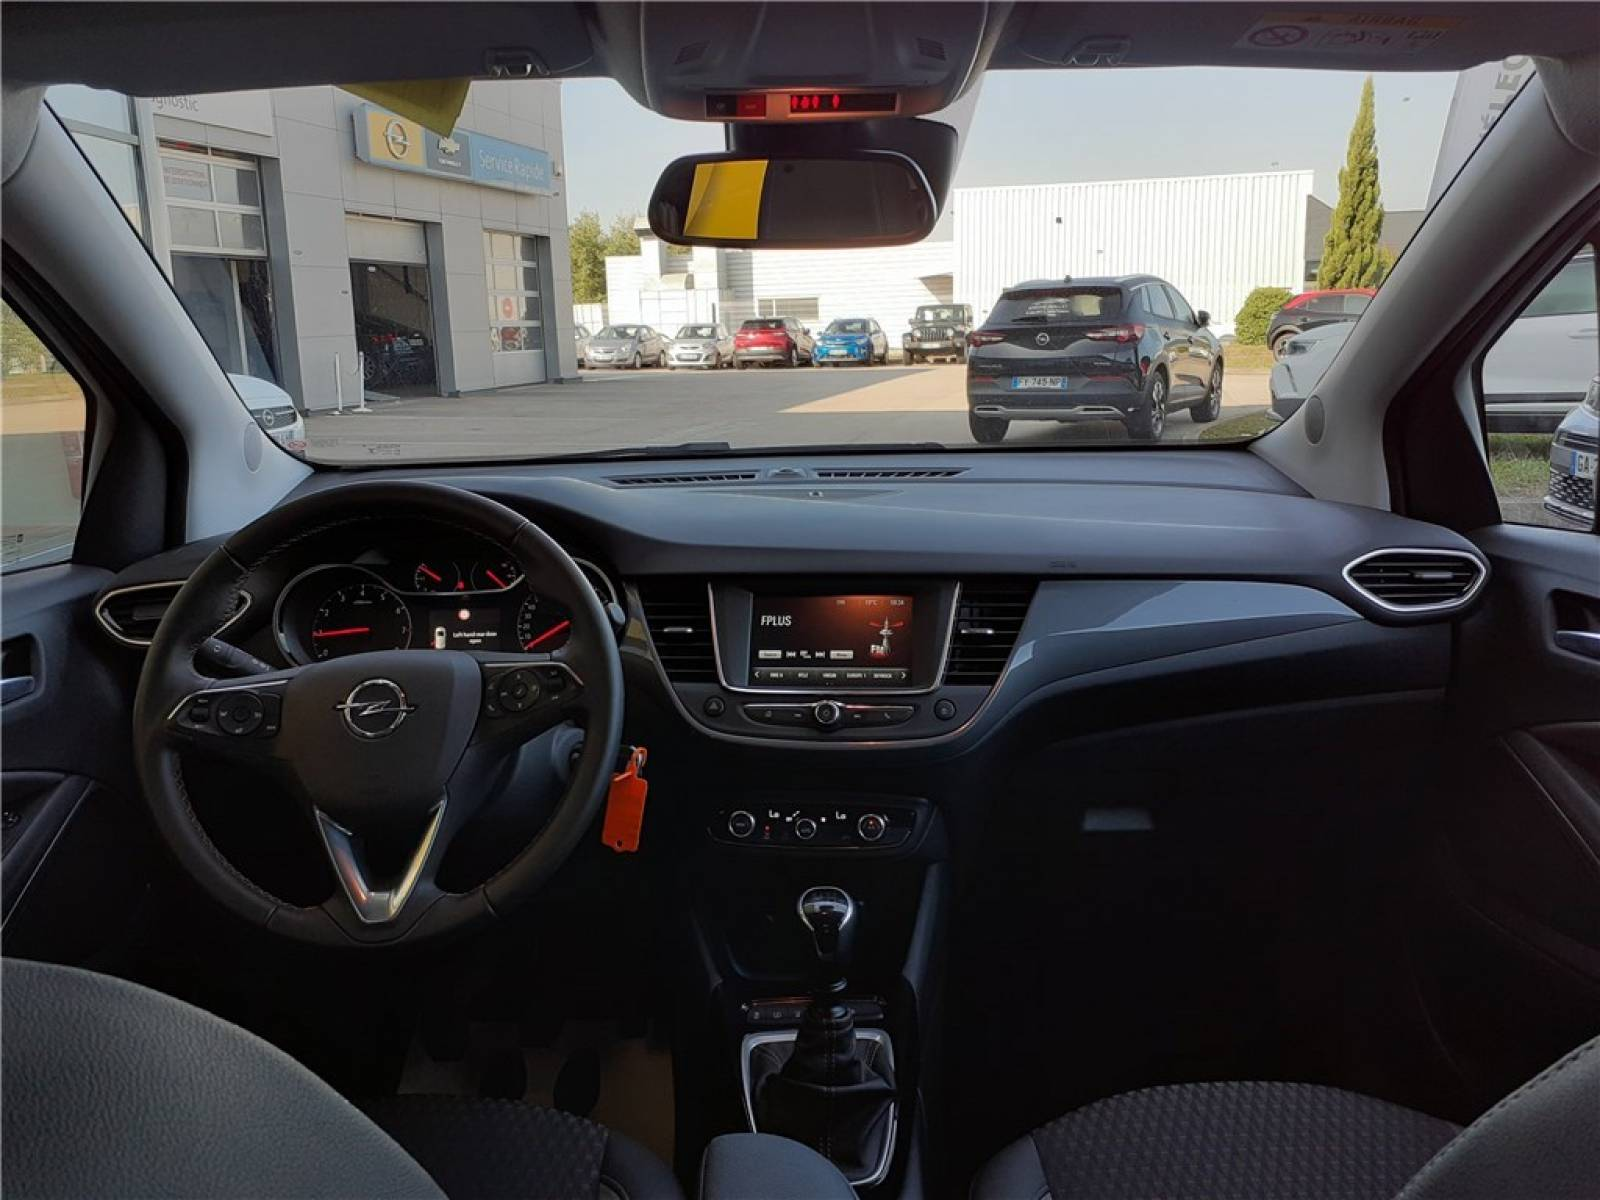 OPEL Crossland X 1.2 Turbo 110 ch - véhicule d'occasion - Groupe Guillet - Opel Magicauto - Chalon-sur-Saône - 71380 - Saint-Marcel - 16